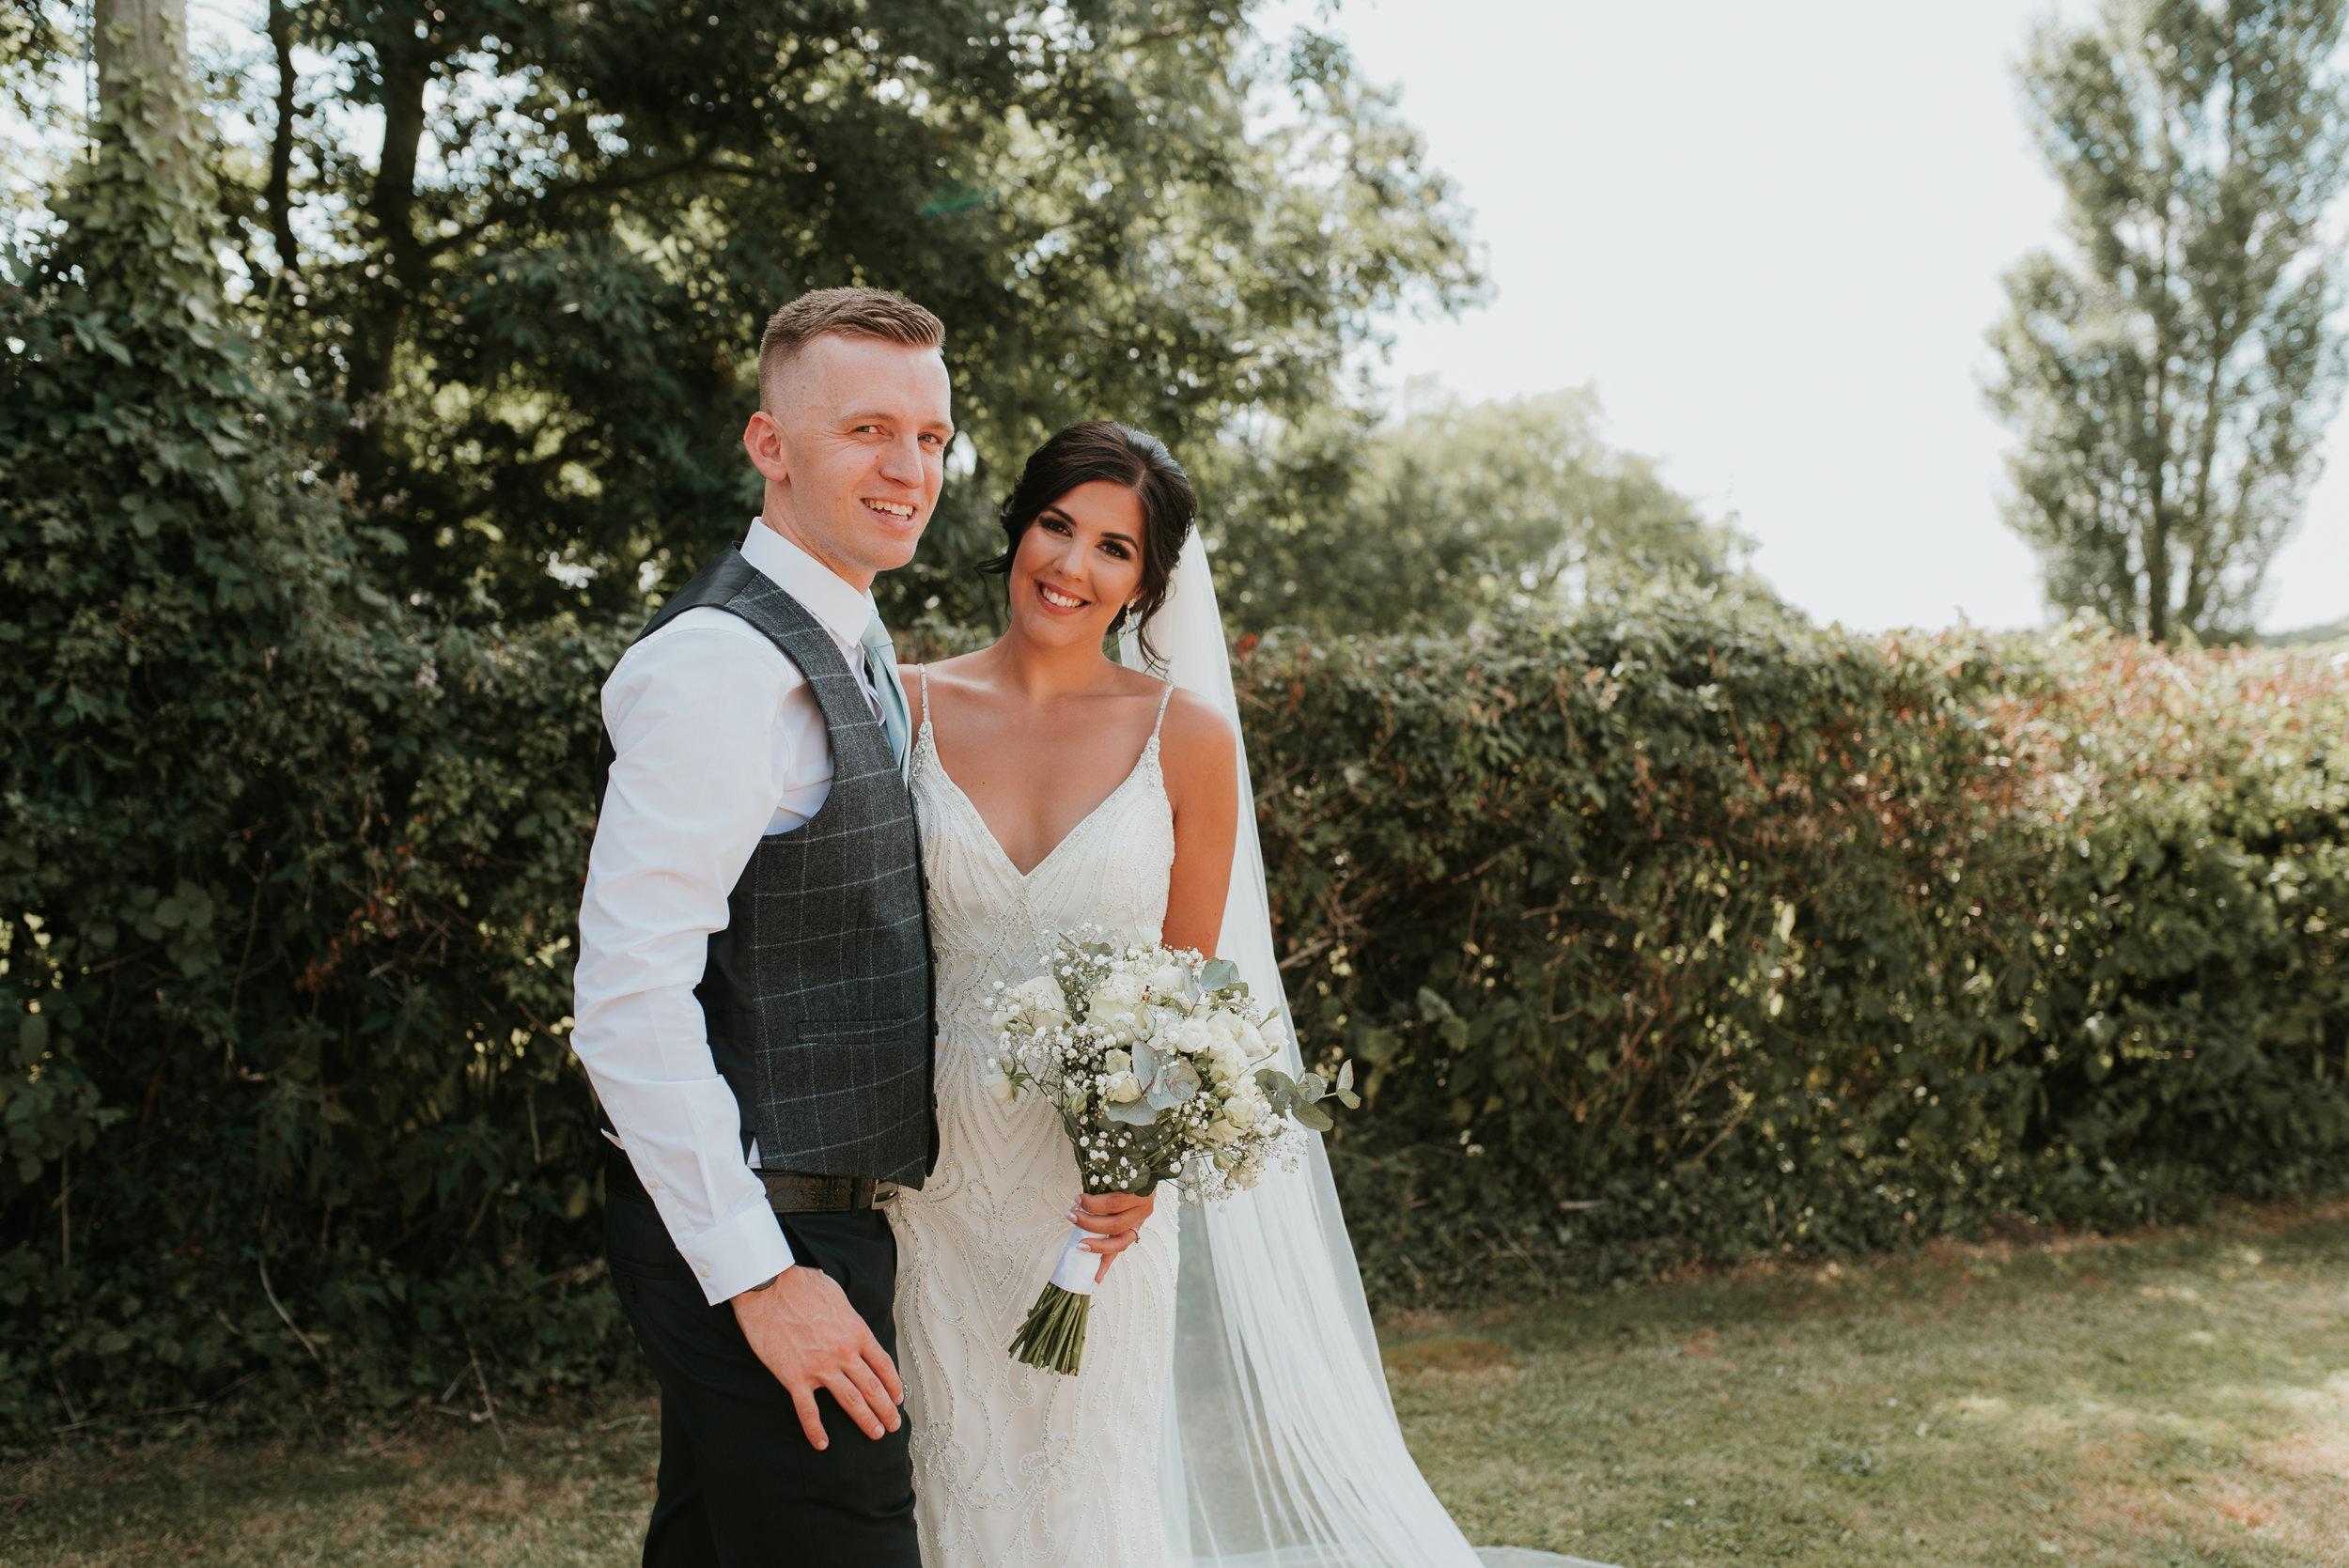 Oxfordshire-wedding-photographer-49.jpg